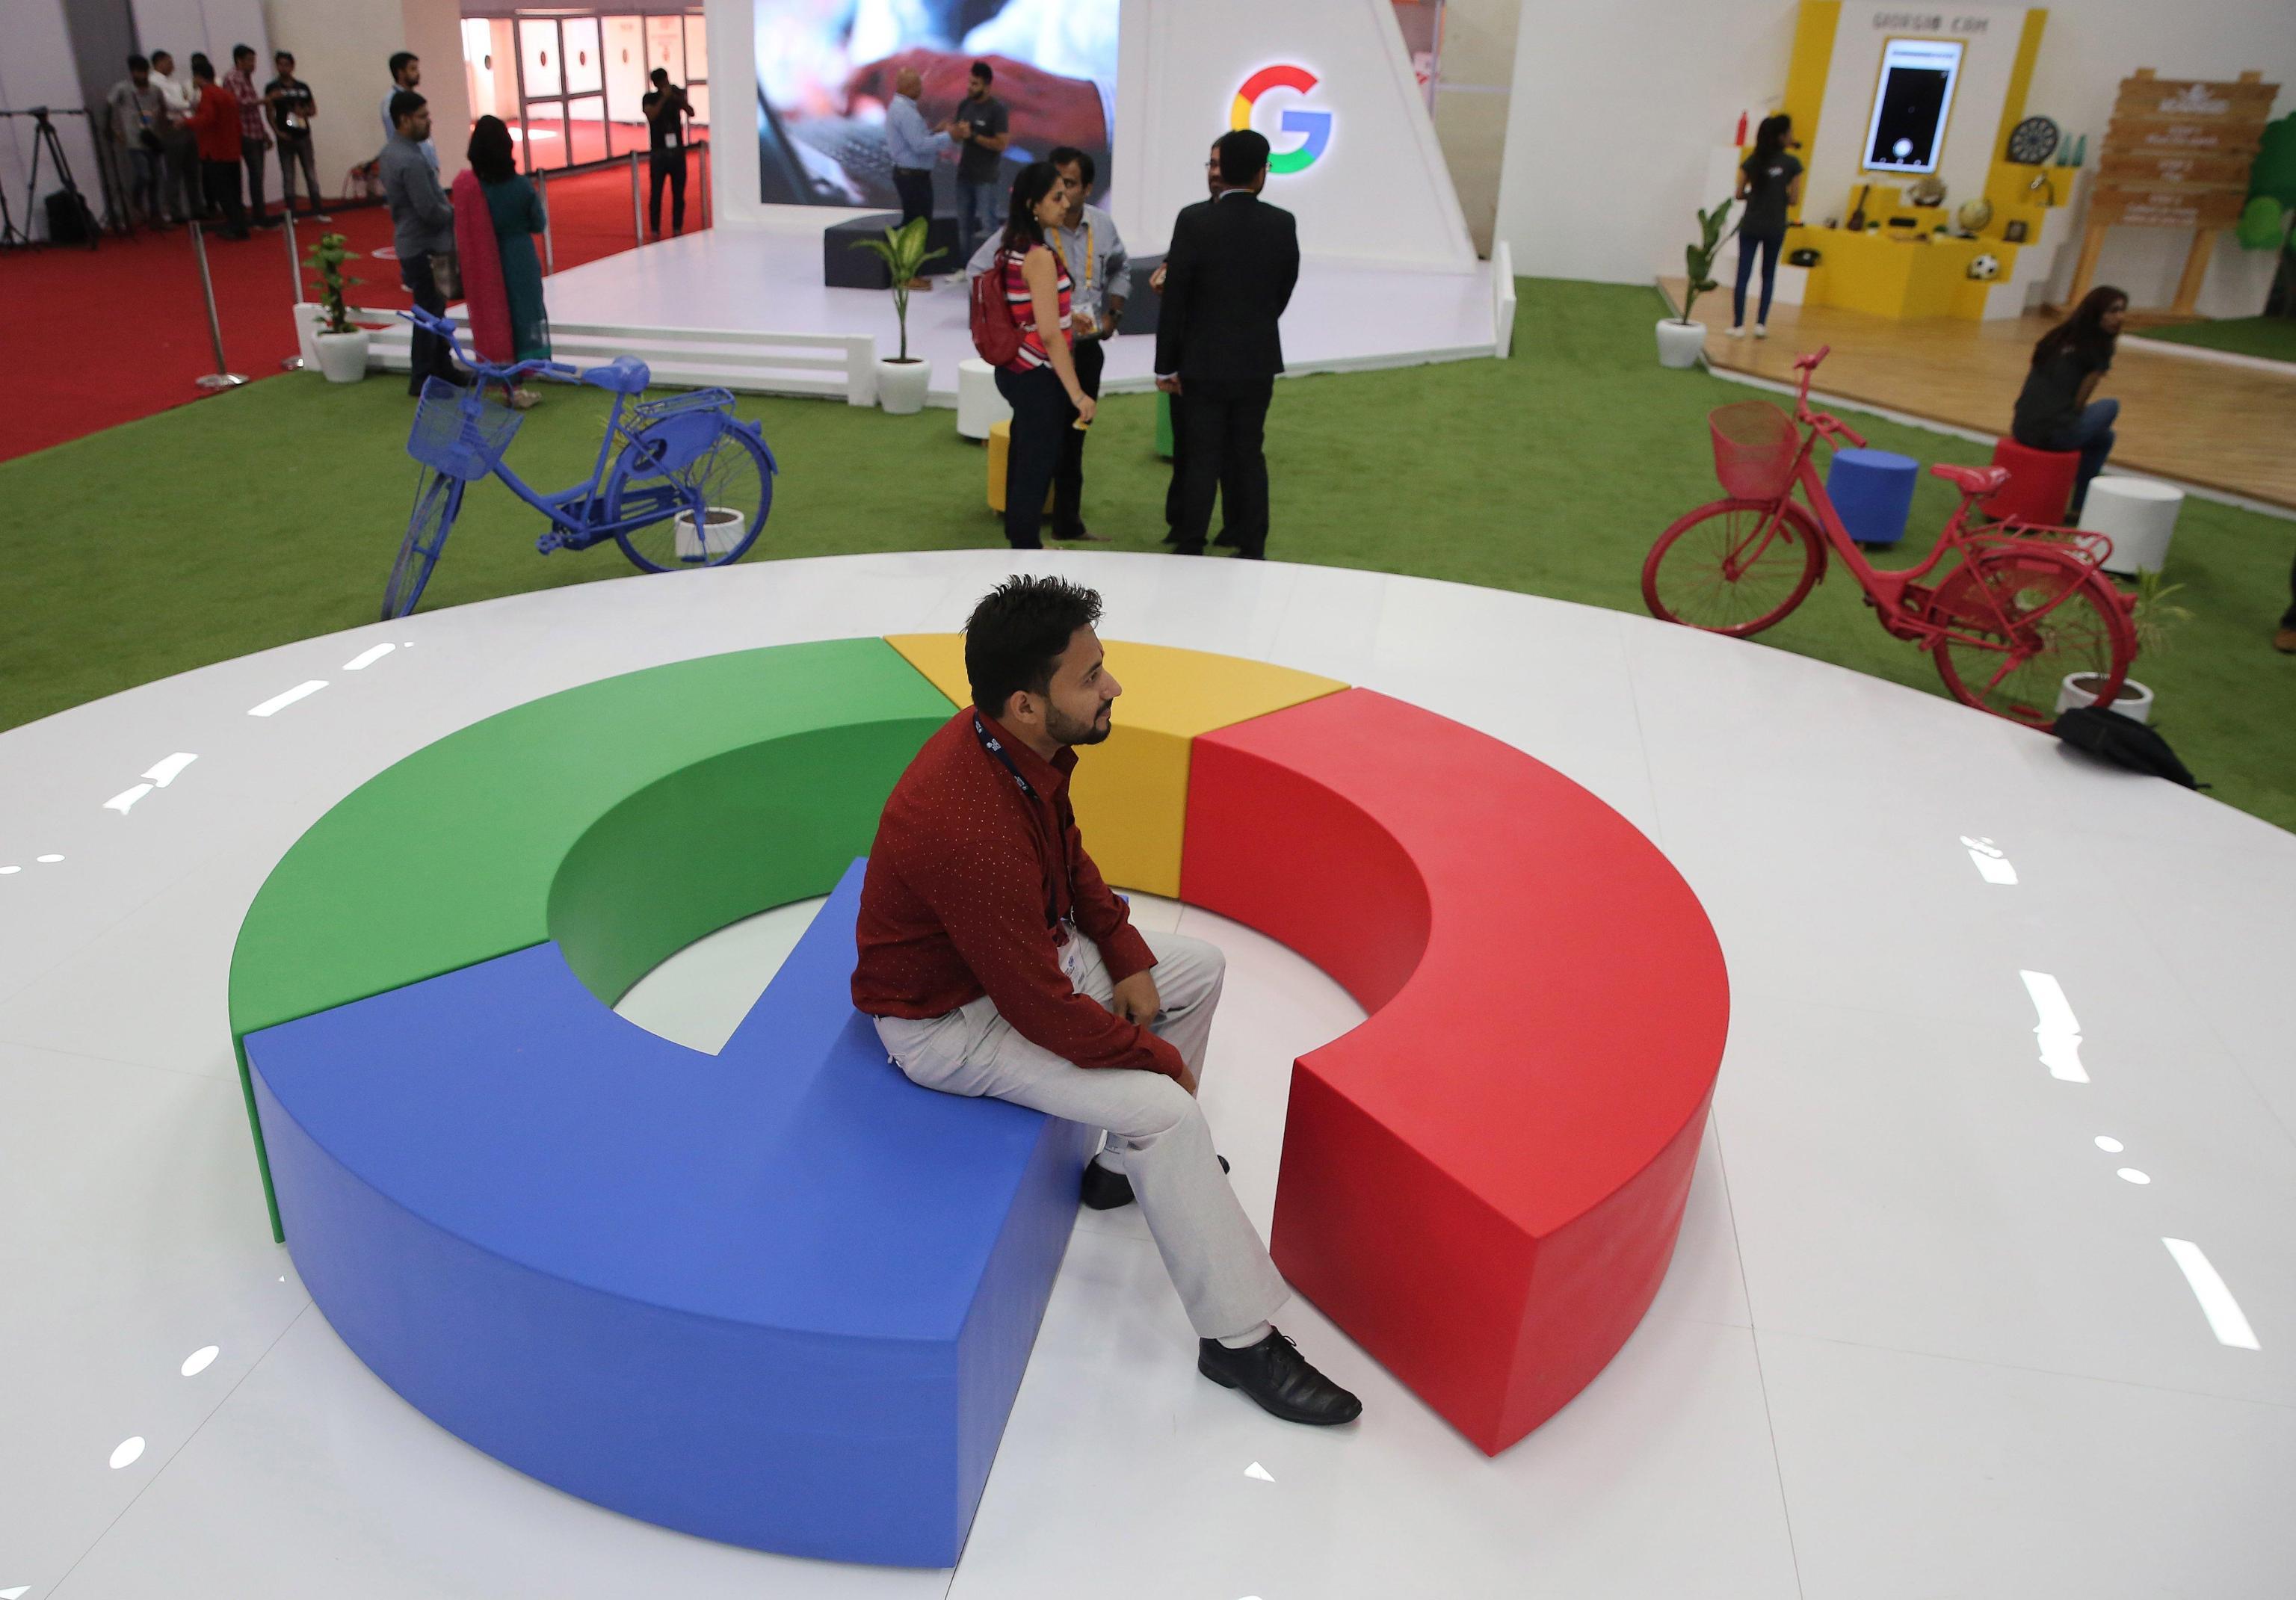 Google, ingegnere licenziato fa causa